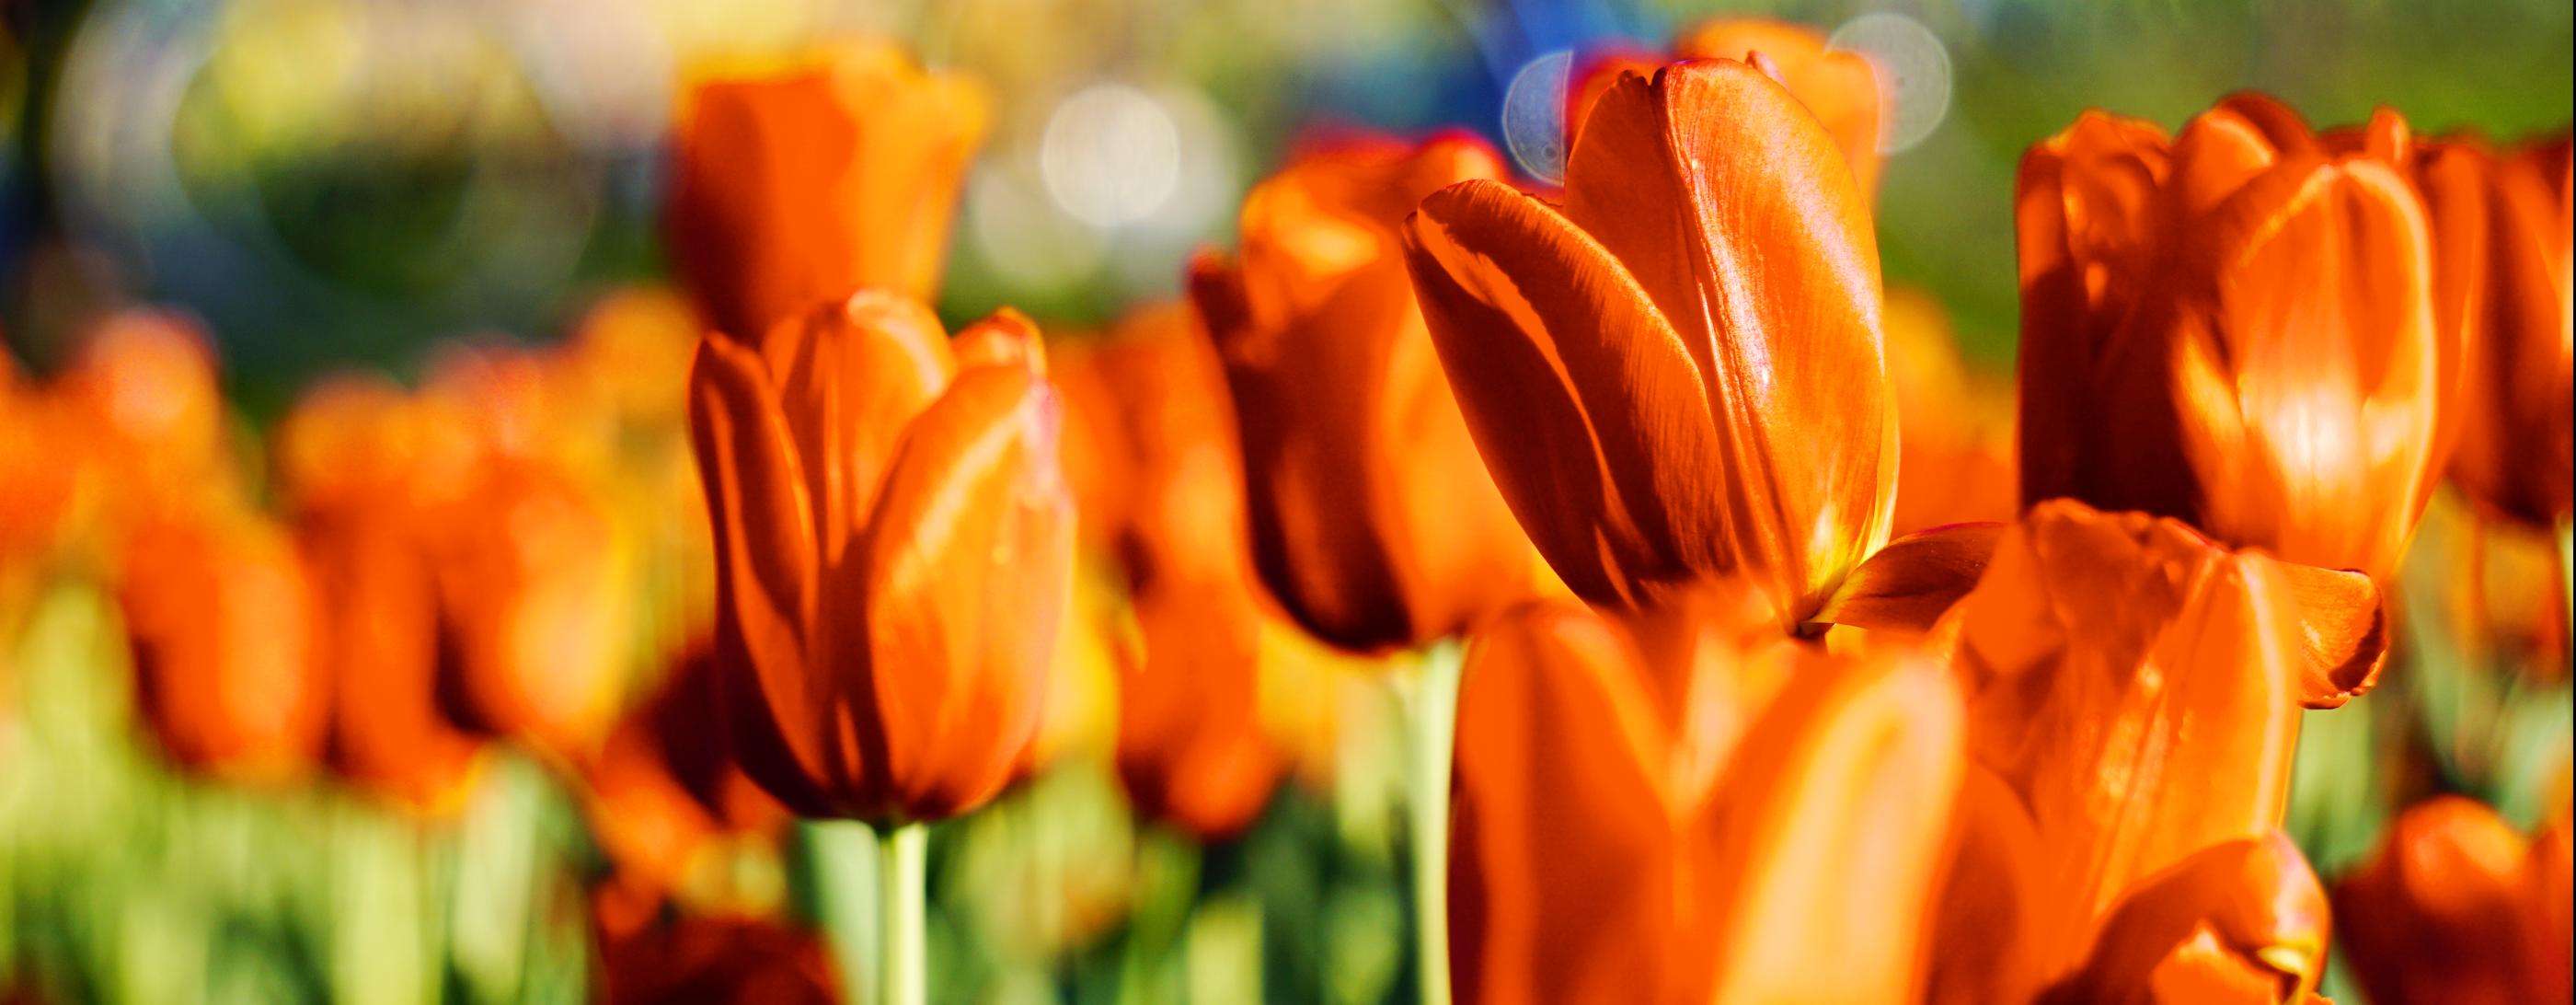 Tulip Time May 412 2019 Holland Michigan